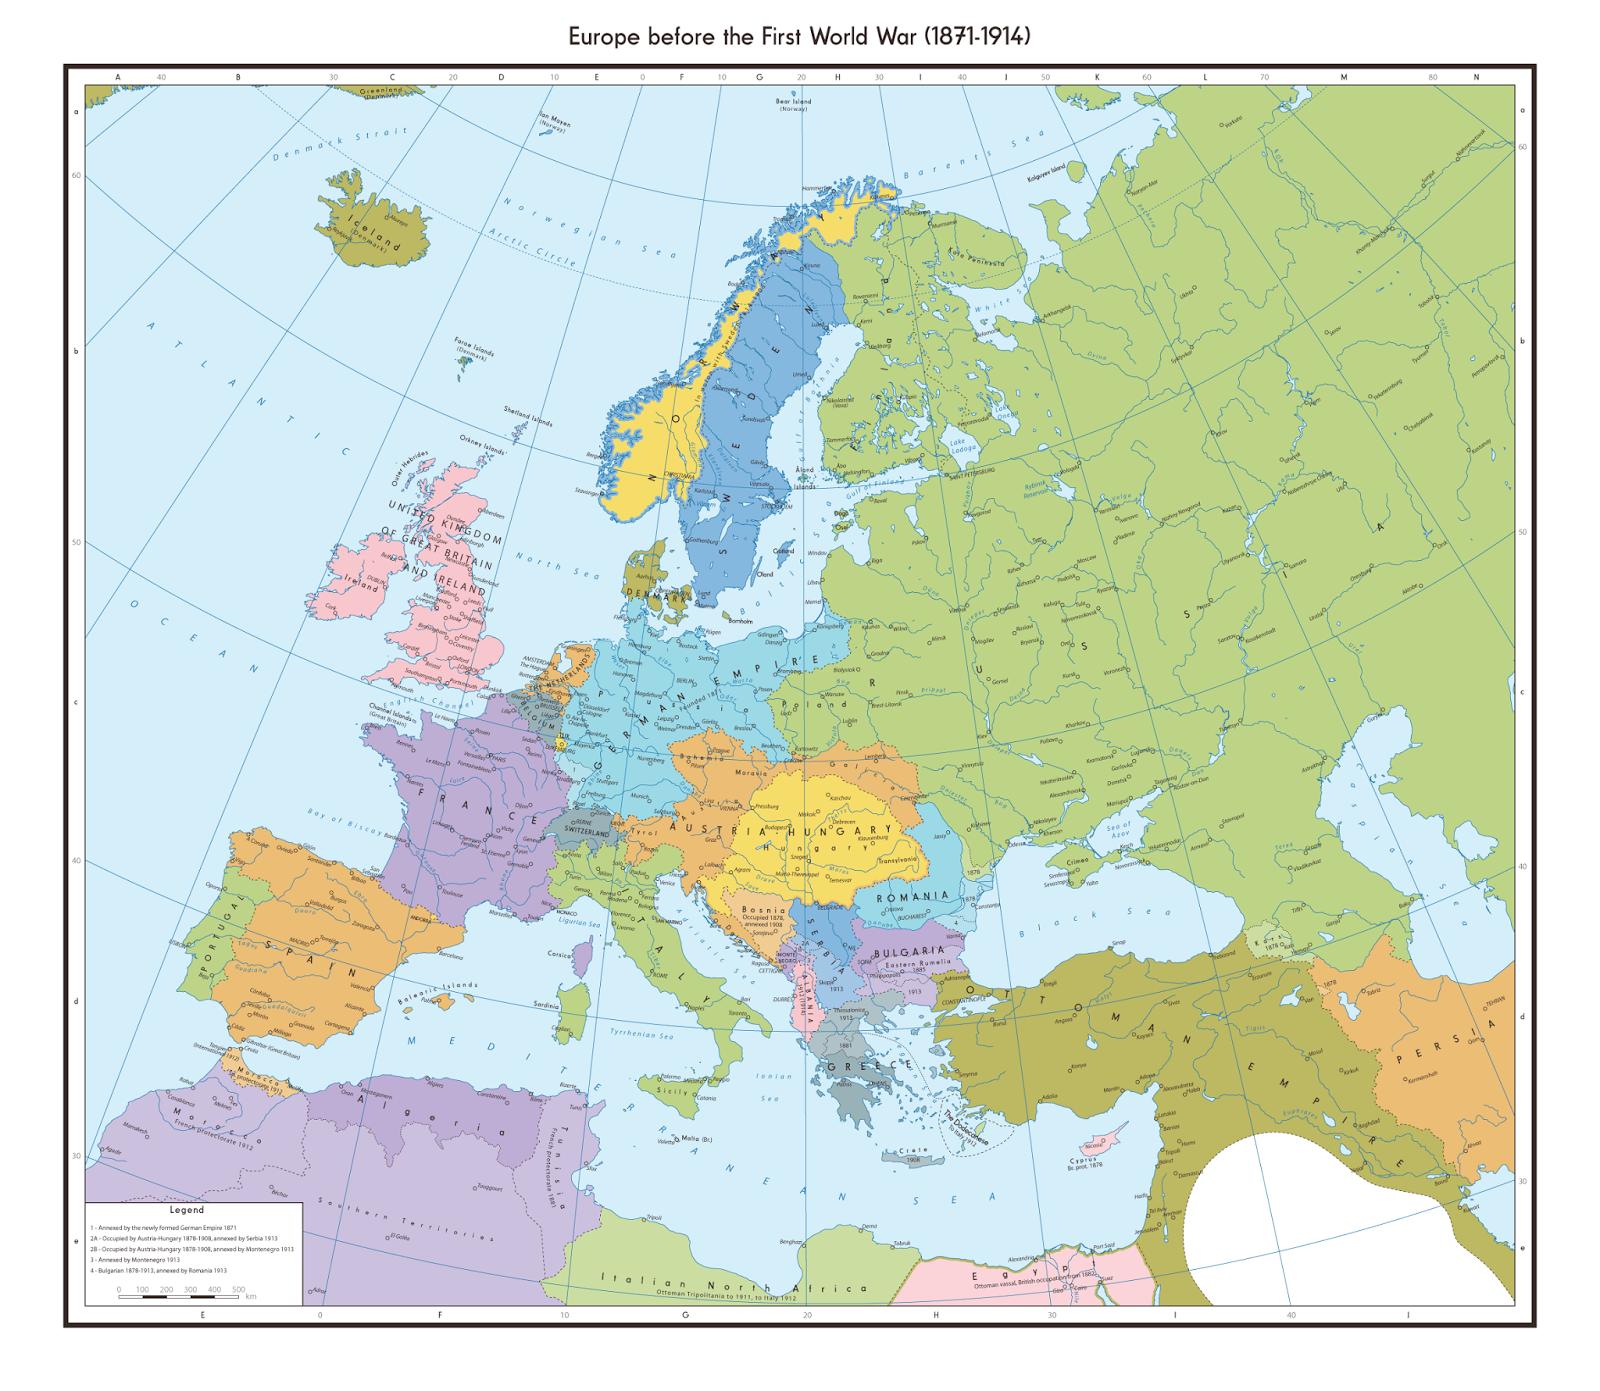 Europe before the First World War (1871 - 1914)